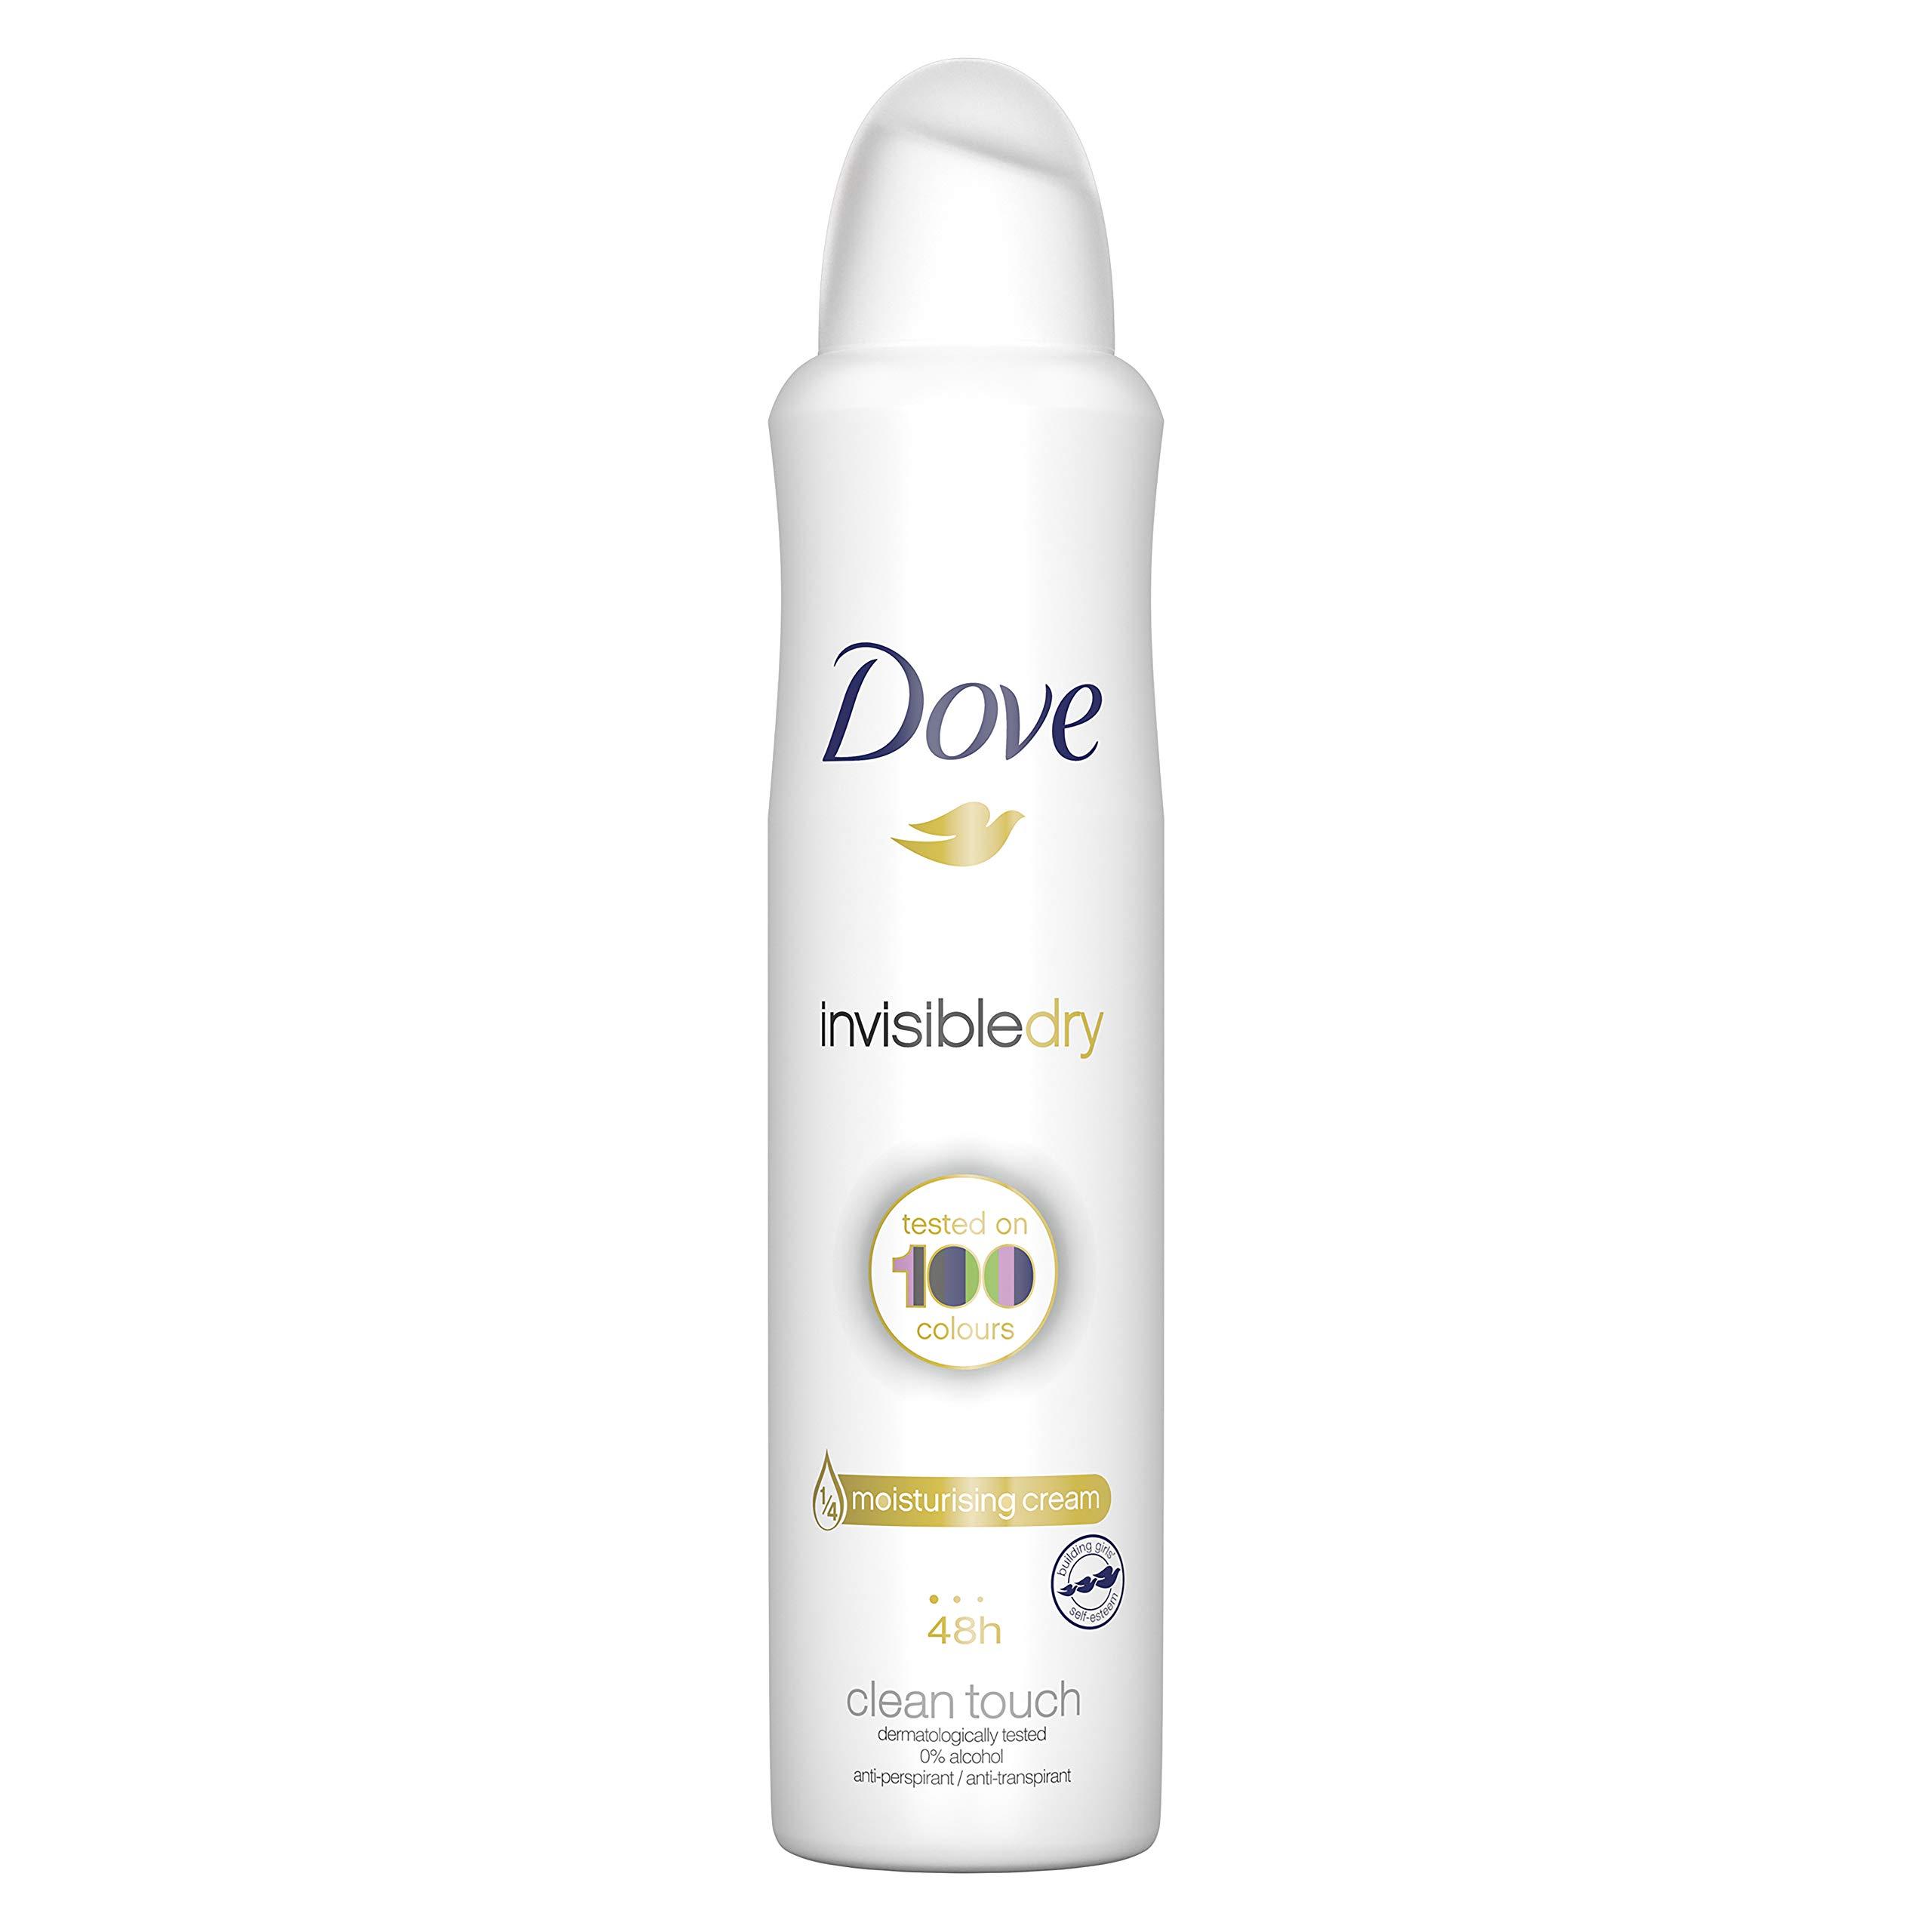 Dove Invisible Dry 48h Anti-Perspirant Deodorant, 250ml